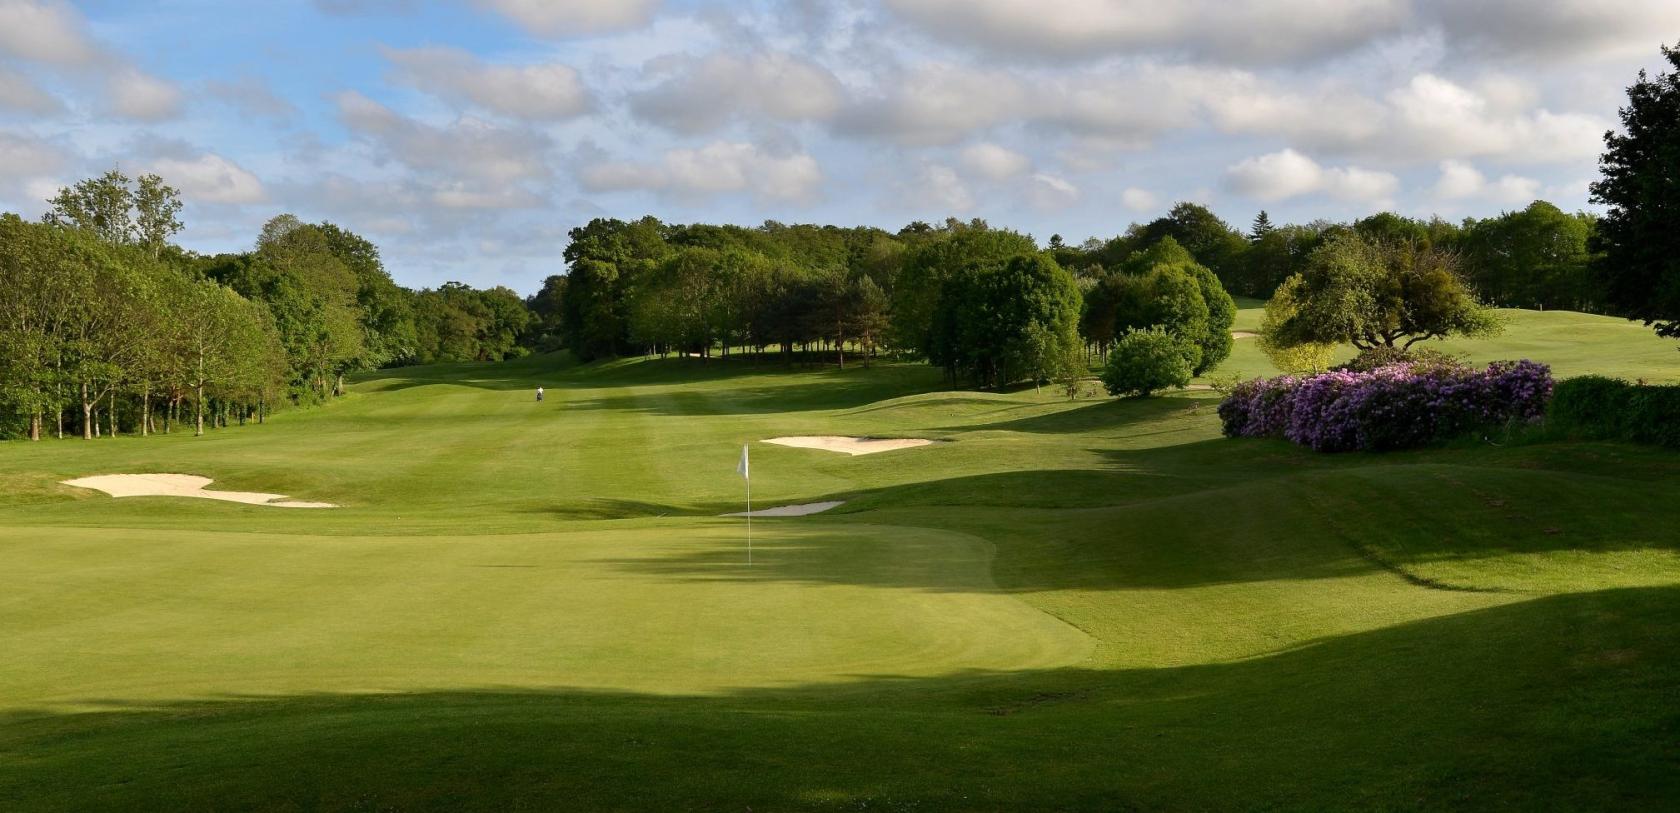 Terrain de golf de Quéven